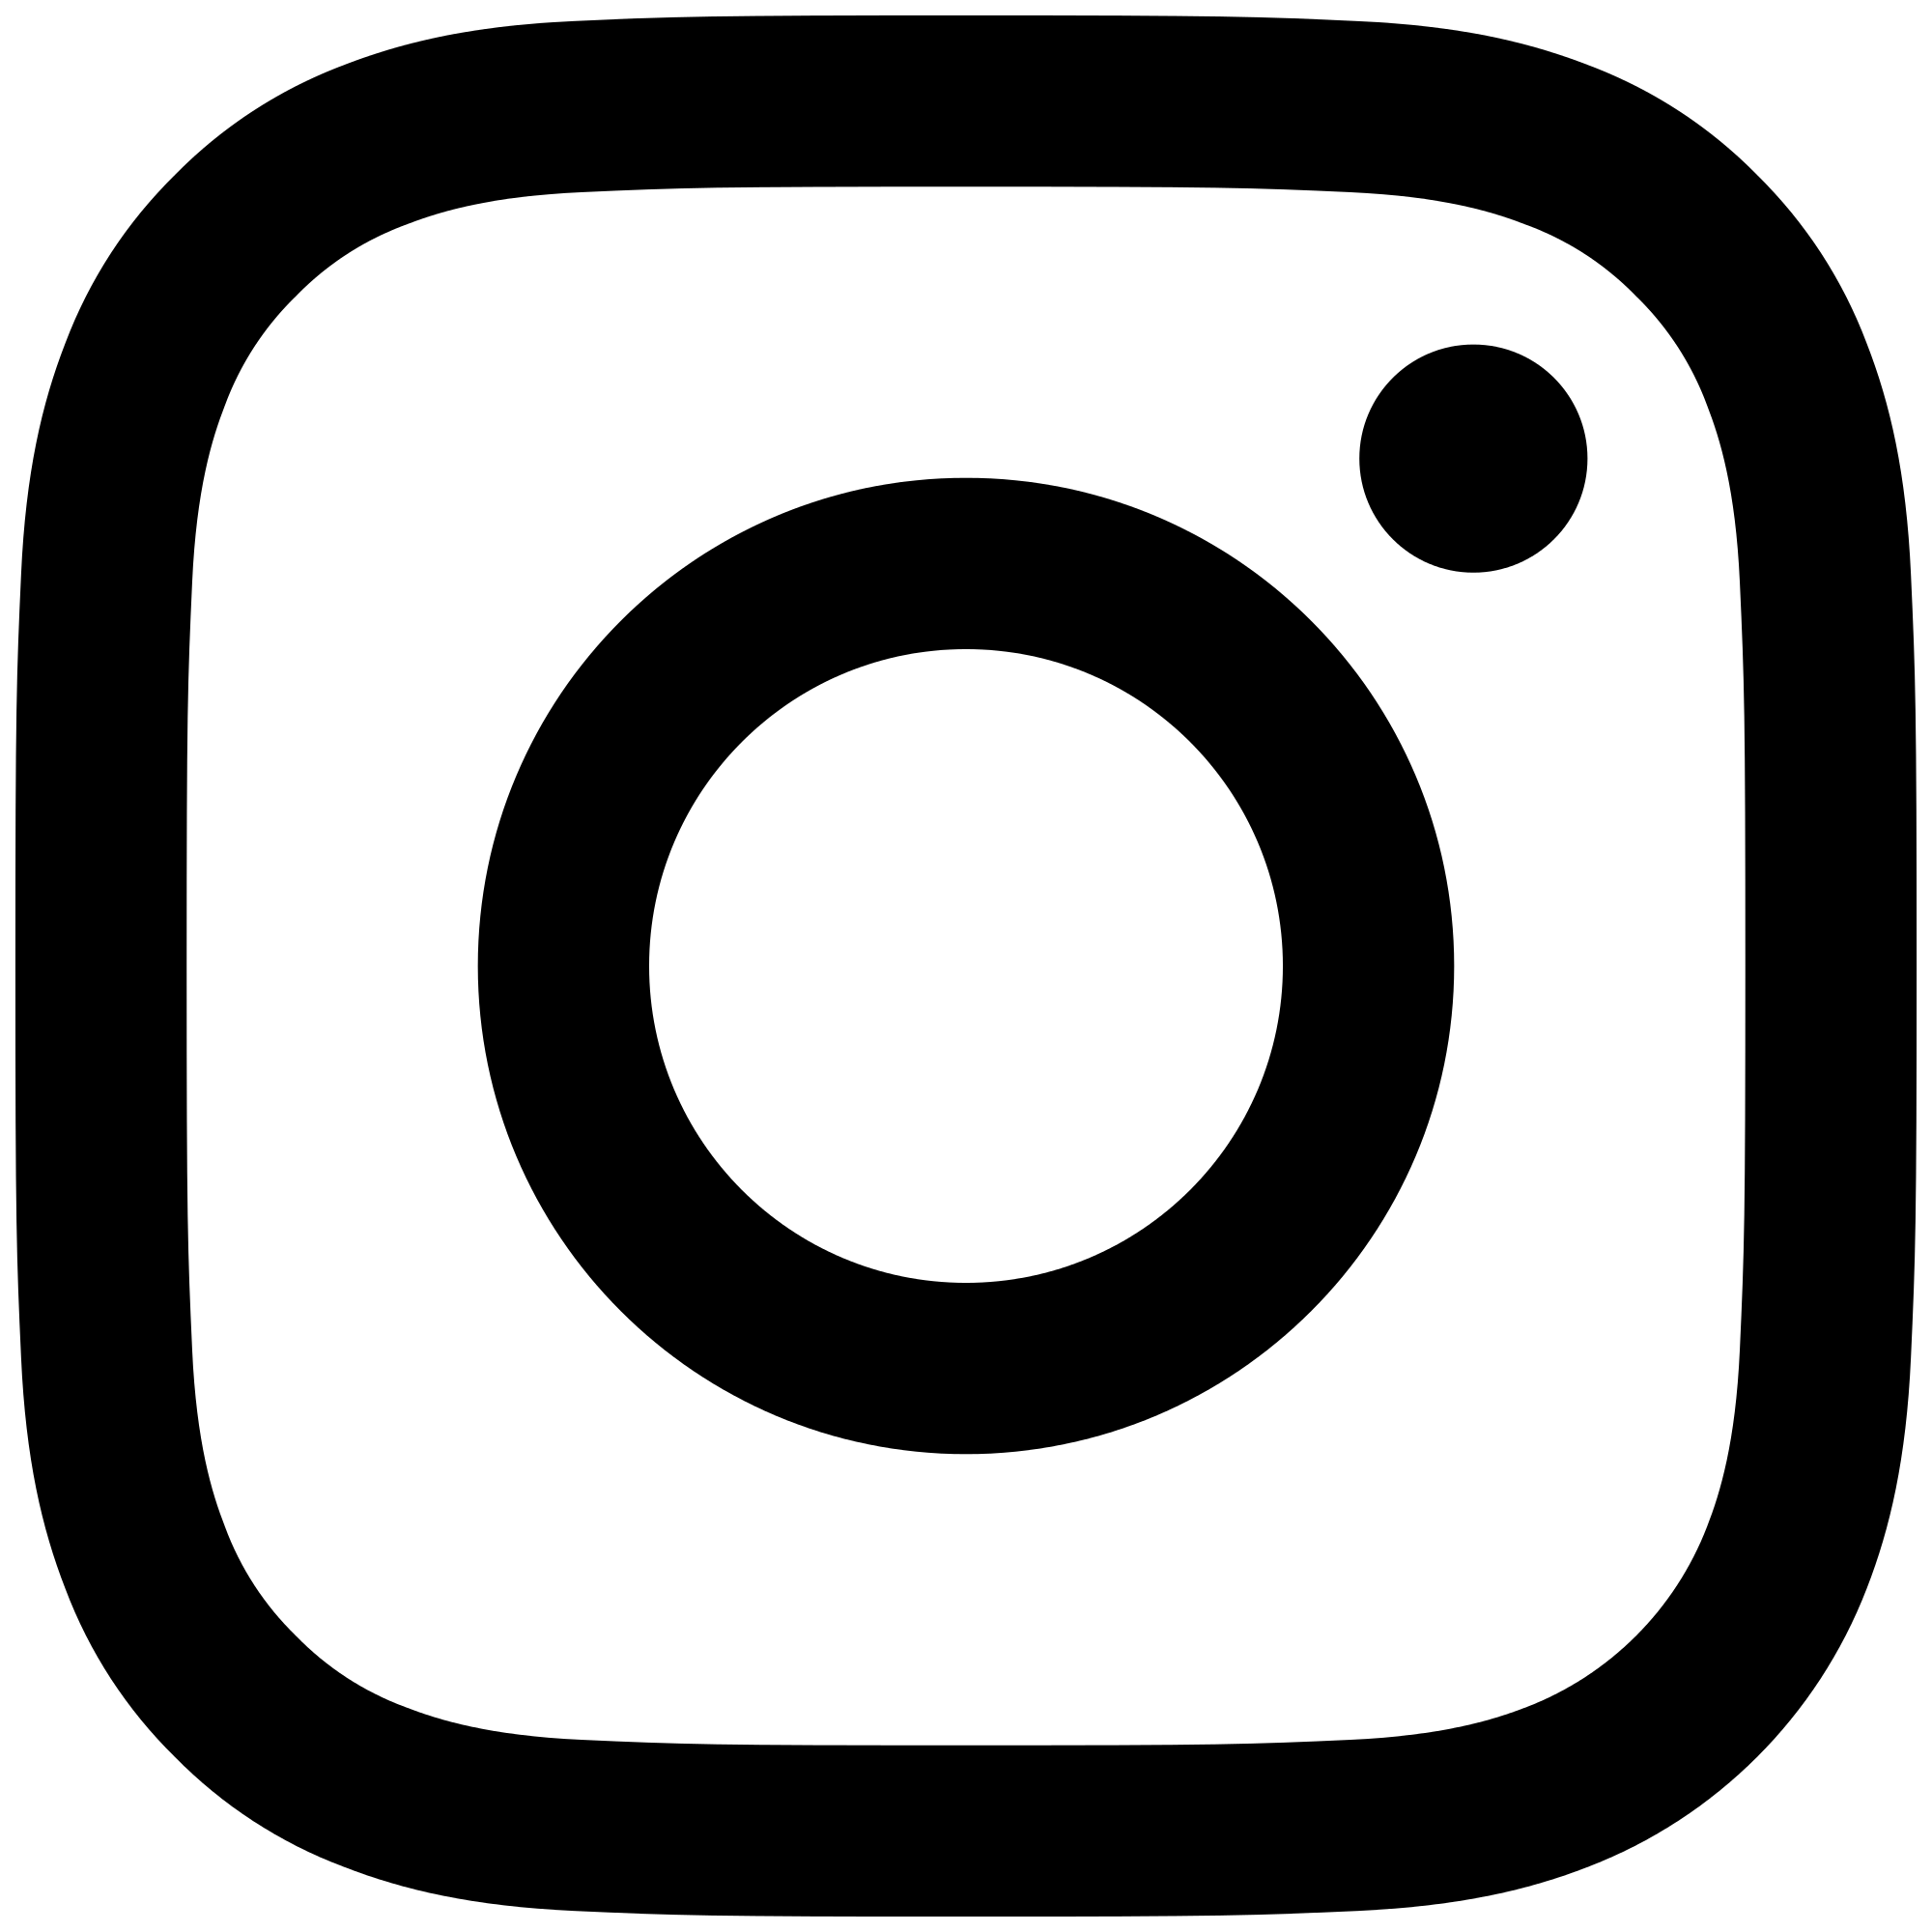 2000pxInstagram_simple_icon.svg.png (2000×2000) Apel